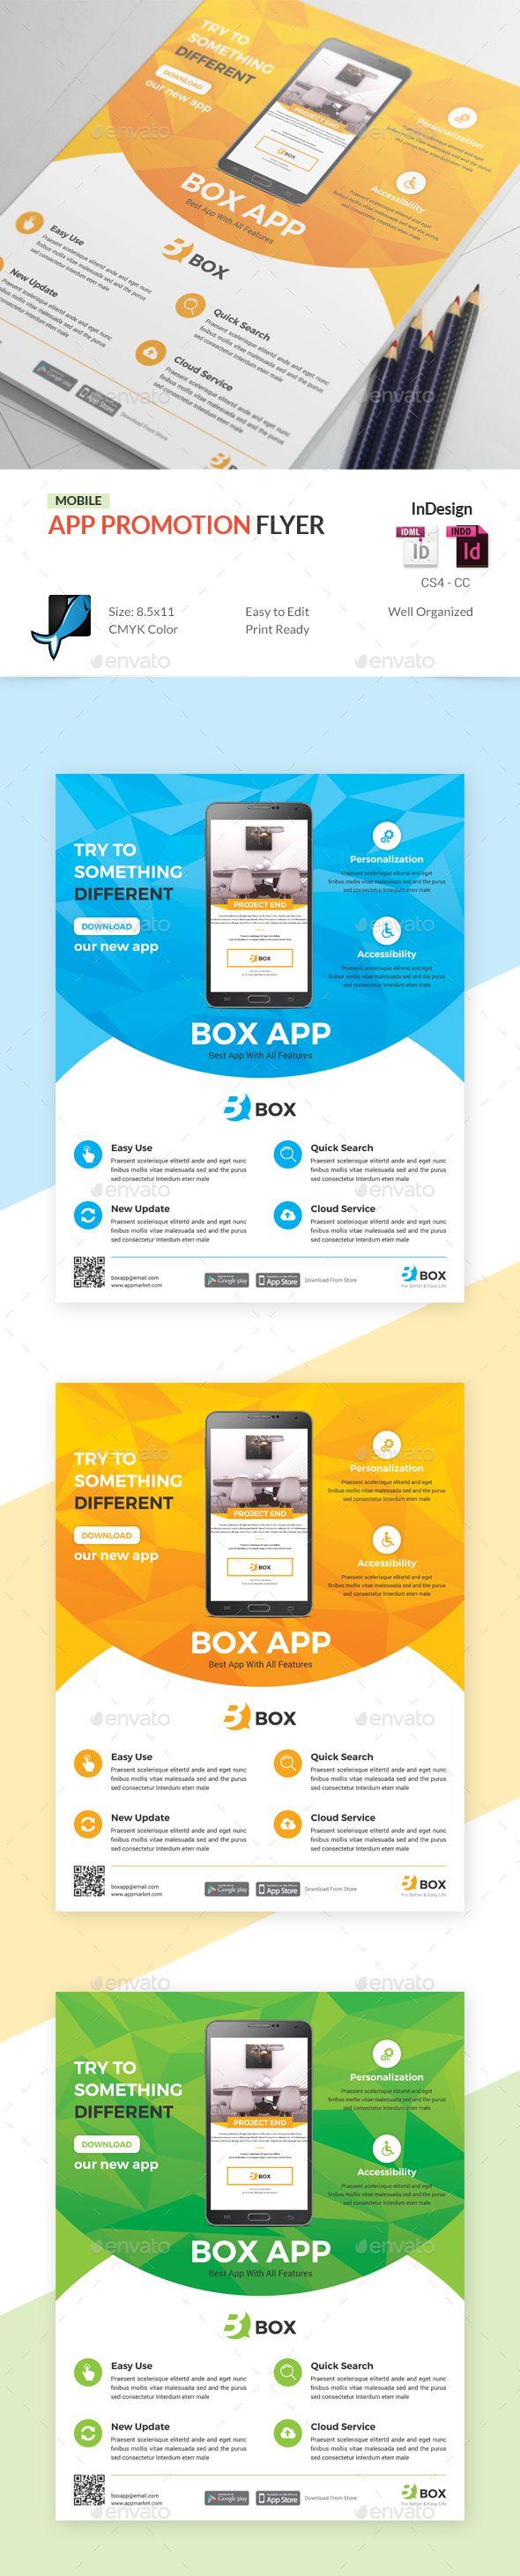 #Mobile #App Promotion #Flyer - Commerce Flyers Download here: https://graphicriver.net/item/mobile-app-promotion-flyer/19747397?ref=alena994